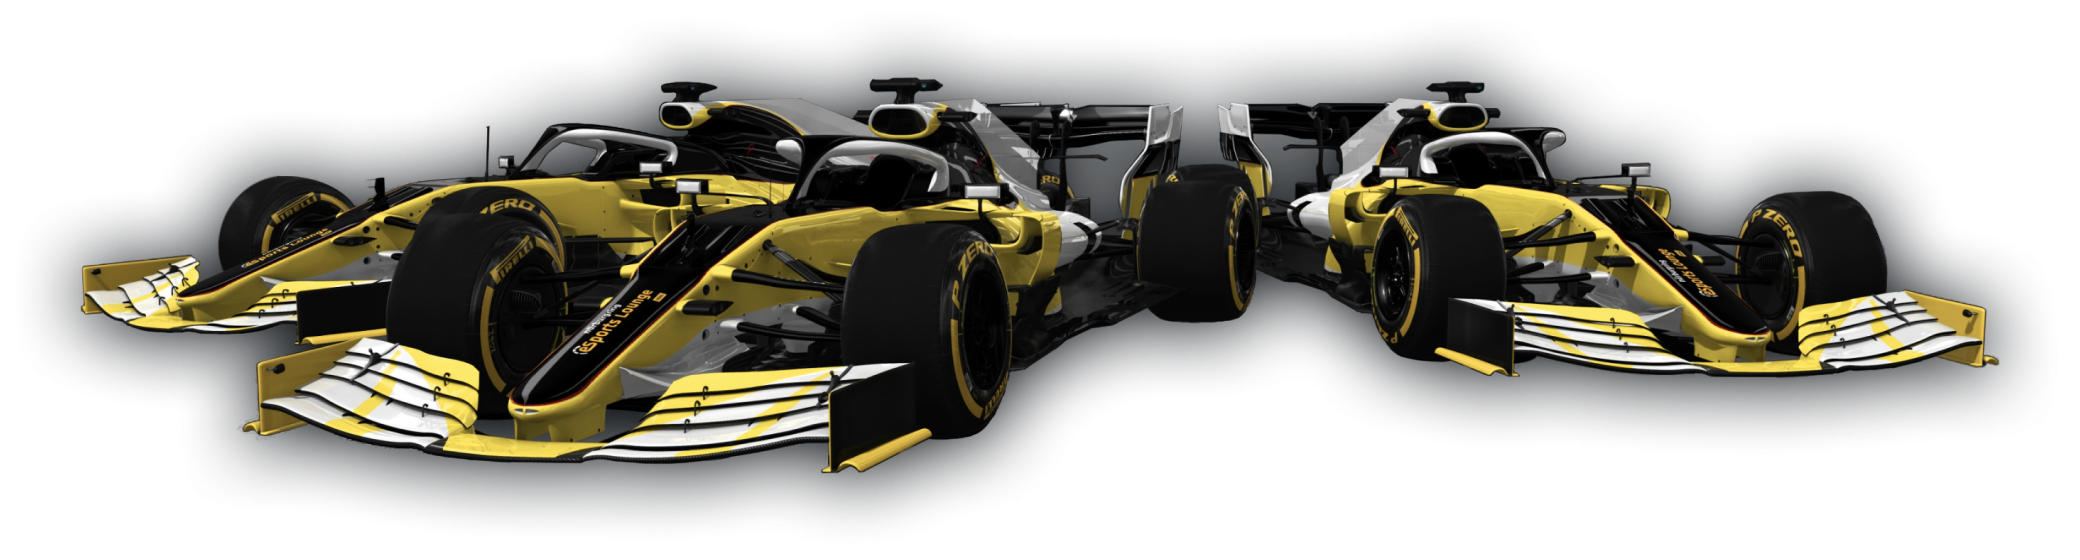 Racing series